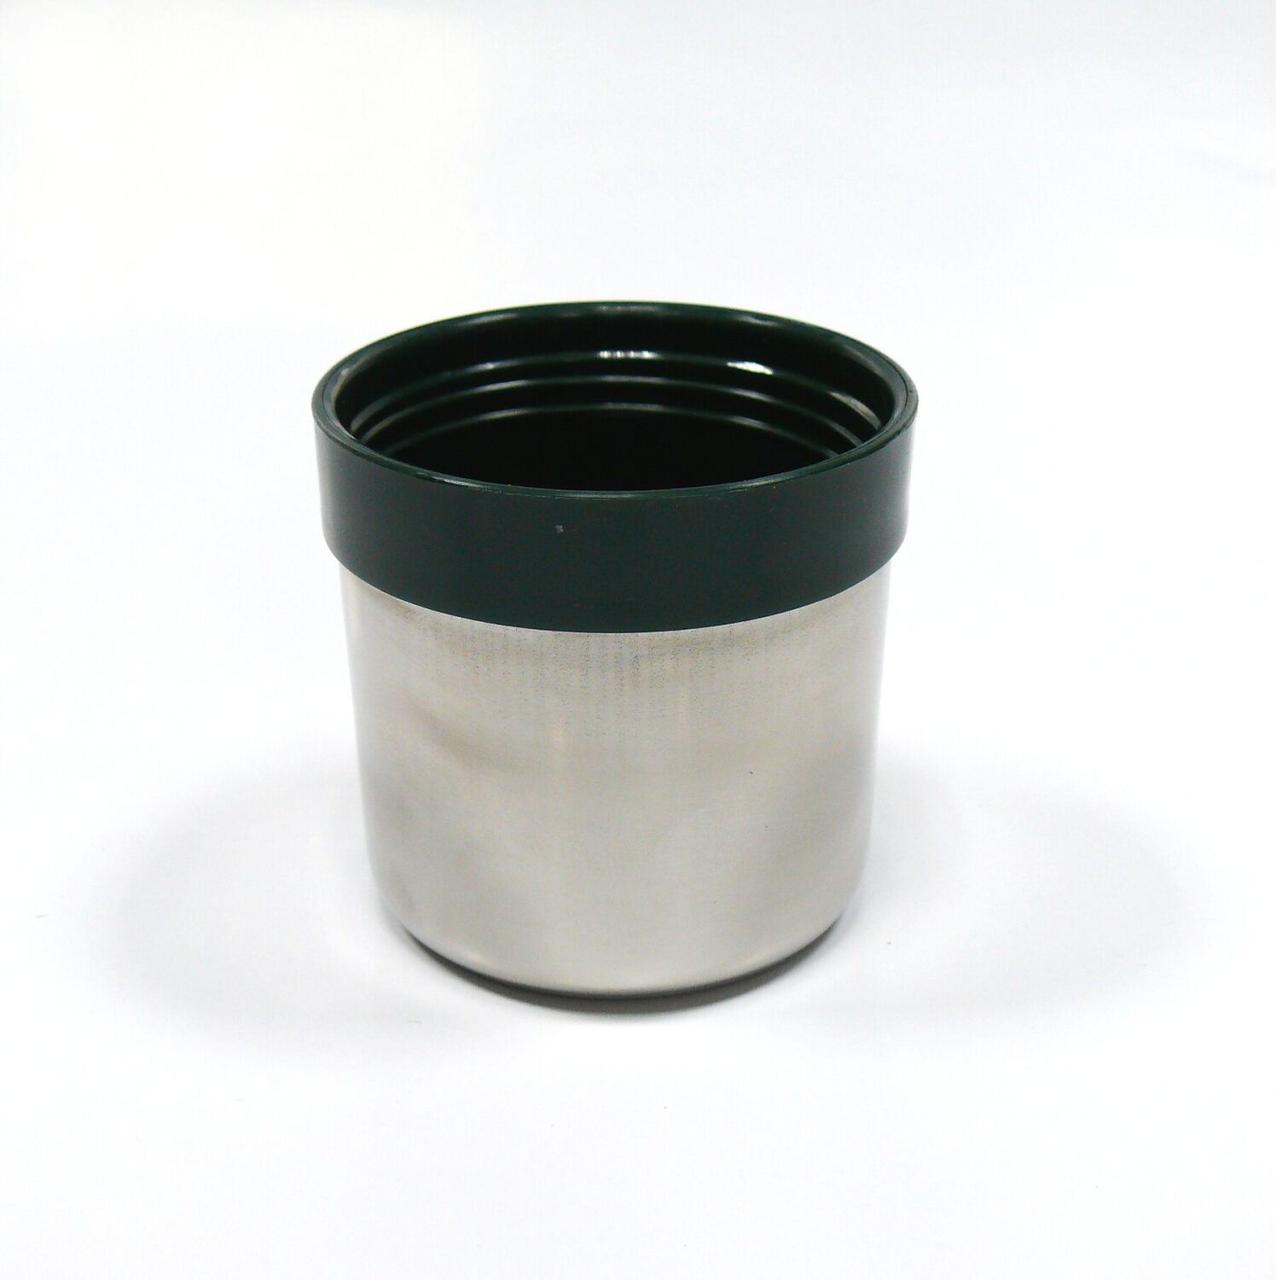 Крышка для термоса Tramp Greenline 2.2 л